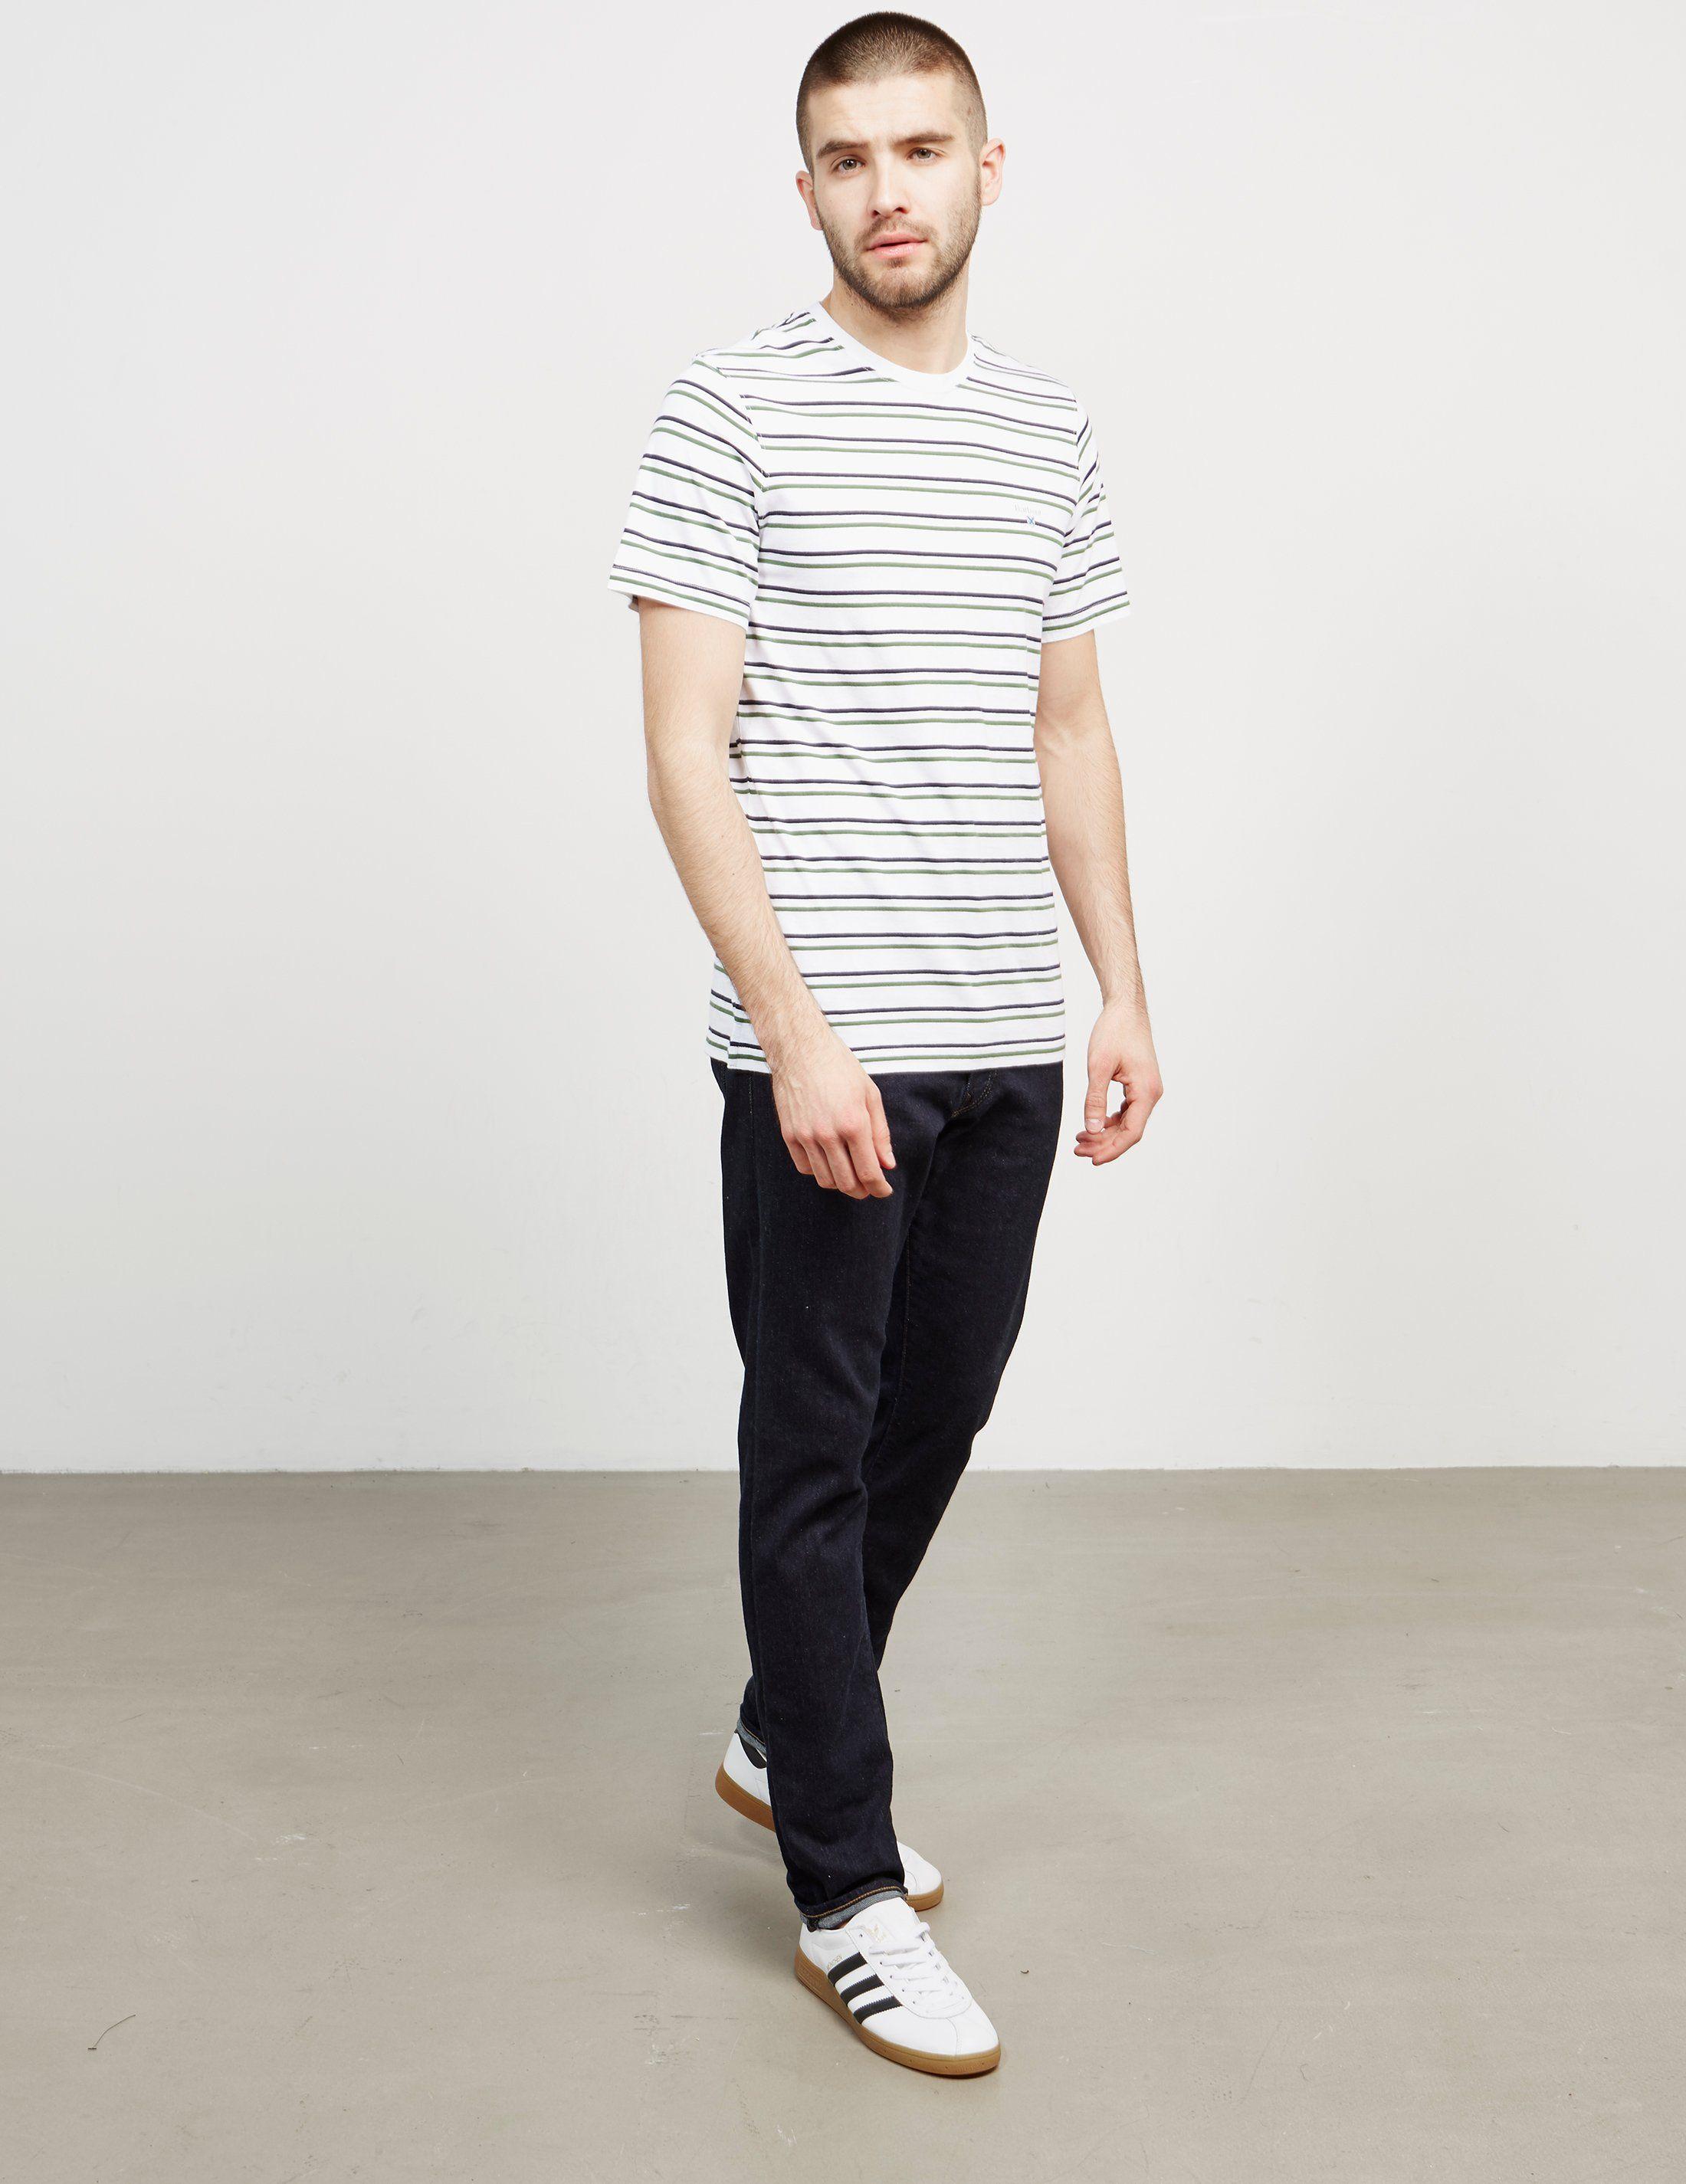 Barbour Duxford Short Sleeve T-Shirt - Online Exclusive